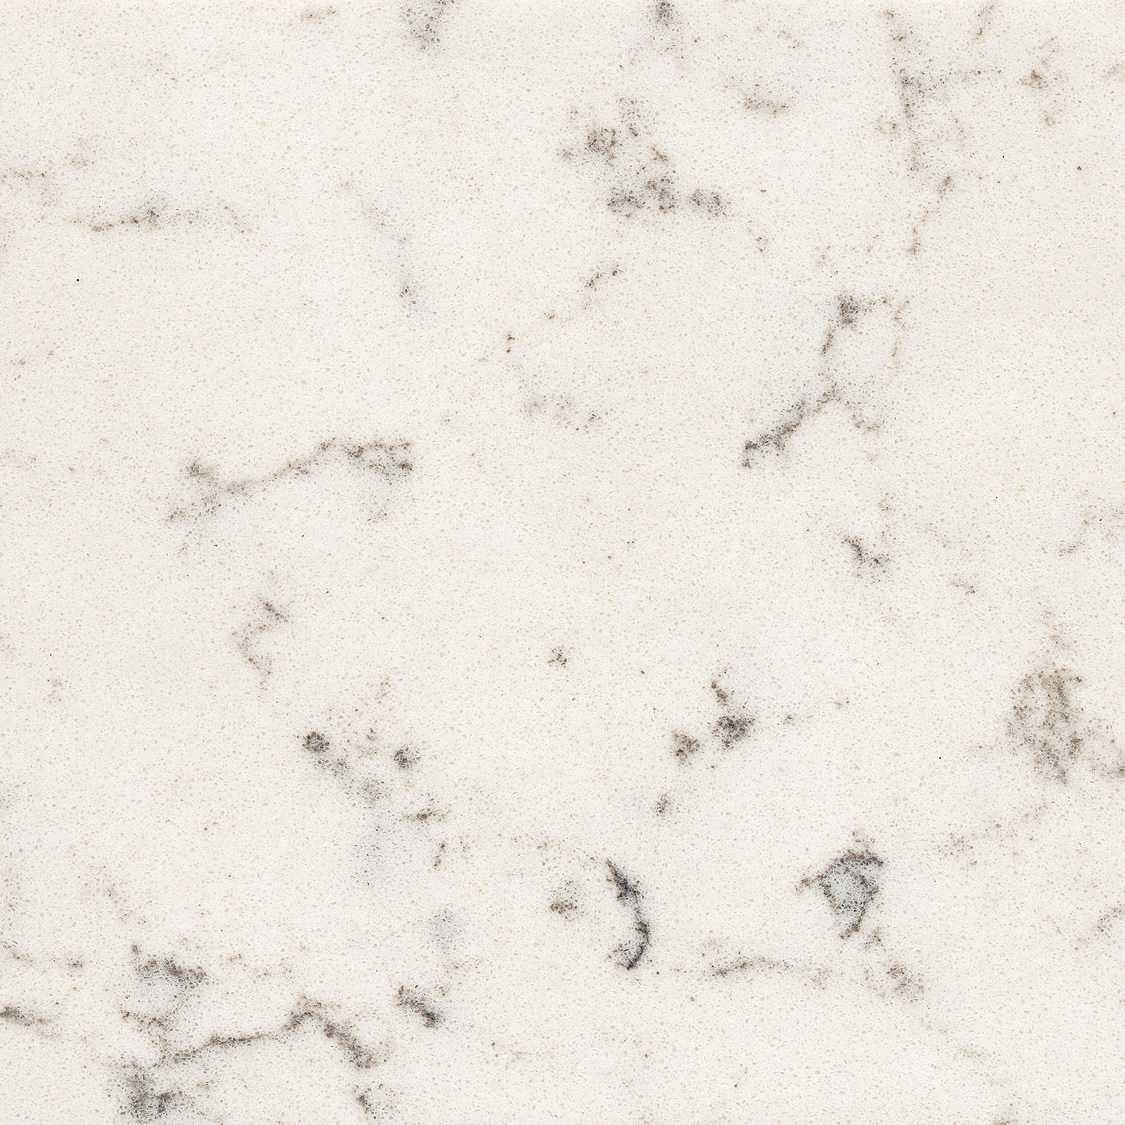 Искусственный камень, Кварц Silestone Lyra 20 мм